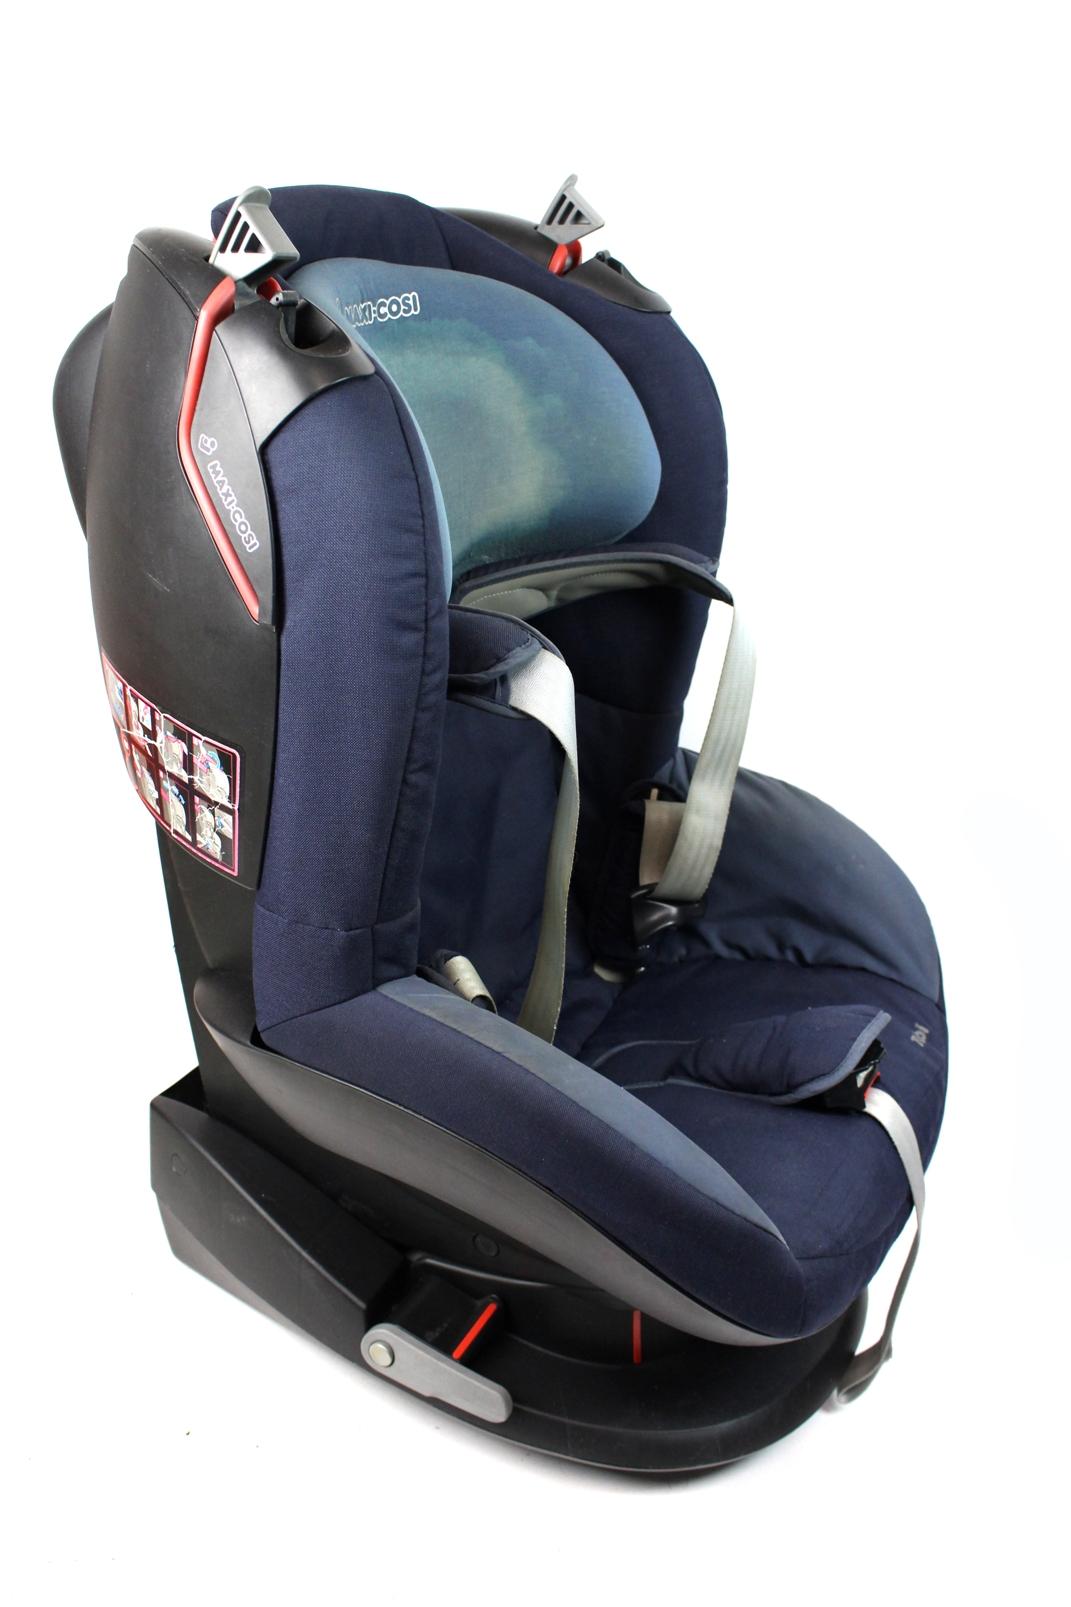 universal auto kinder sitz orig maxi cosi tobi 9 18 kg. Black Bedroom Furniture Sets. Home Design Ideas